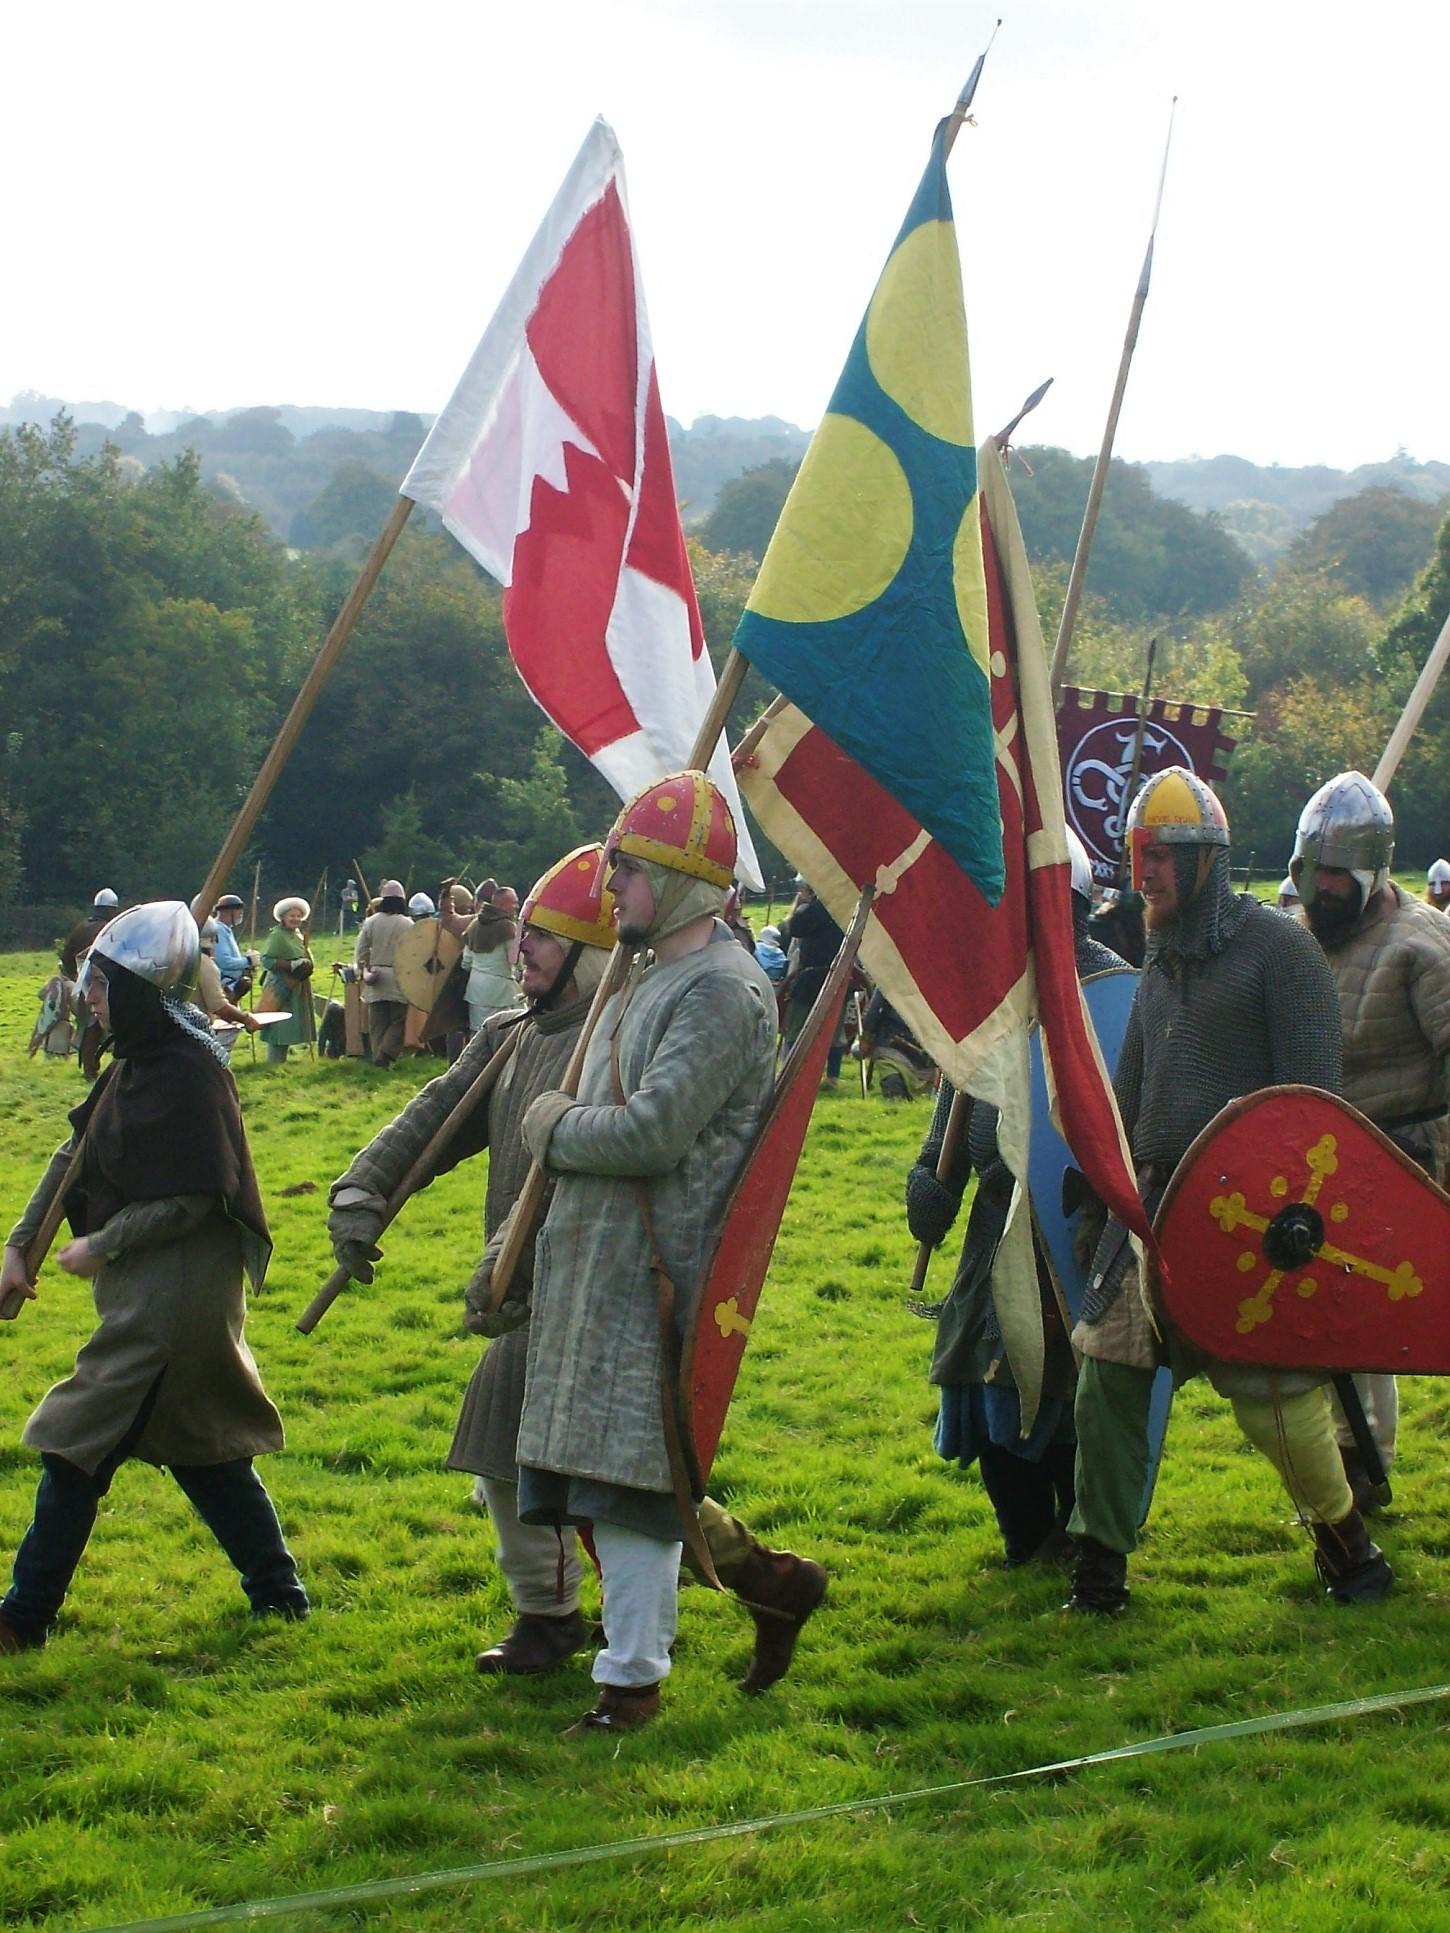 Battle of Hastings 1066 Reenactment